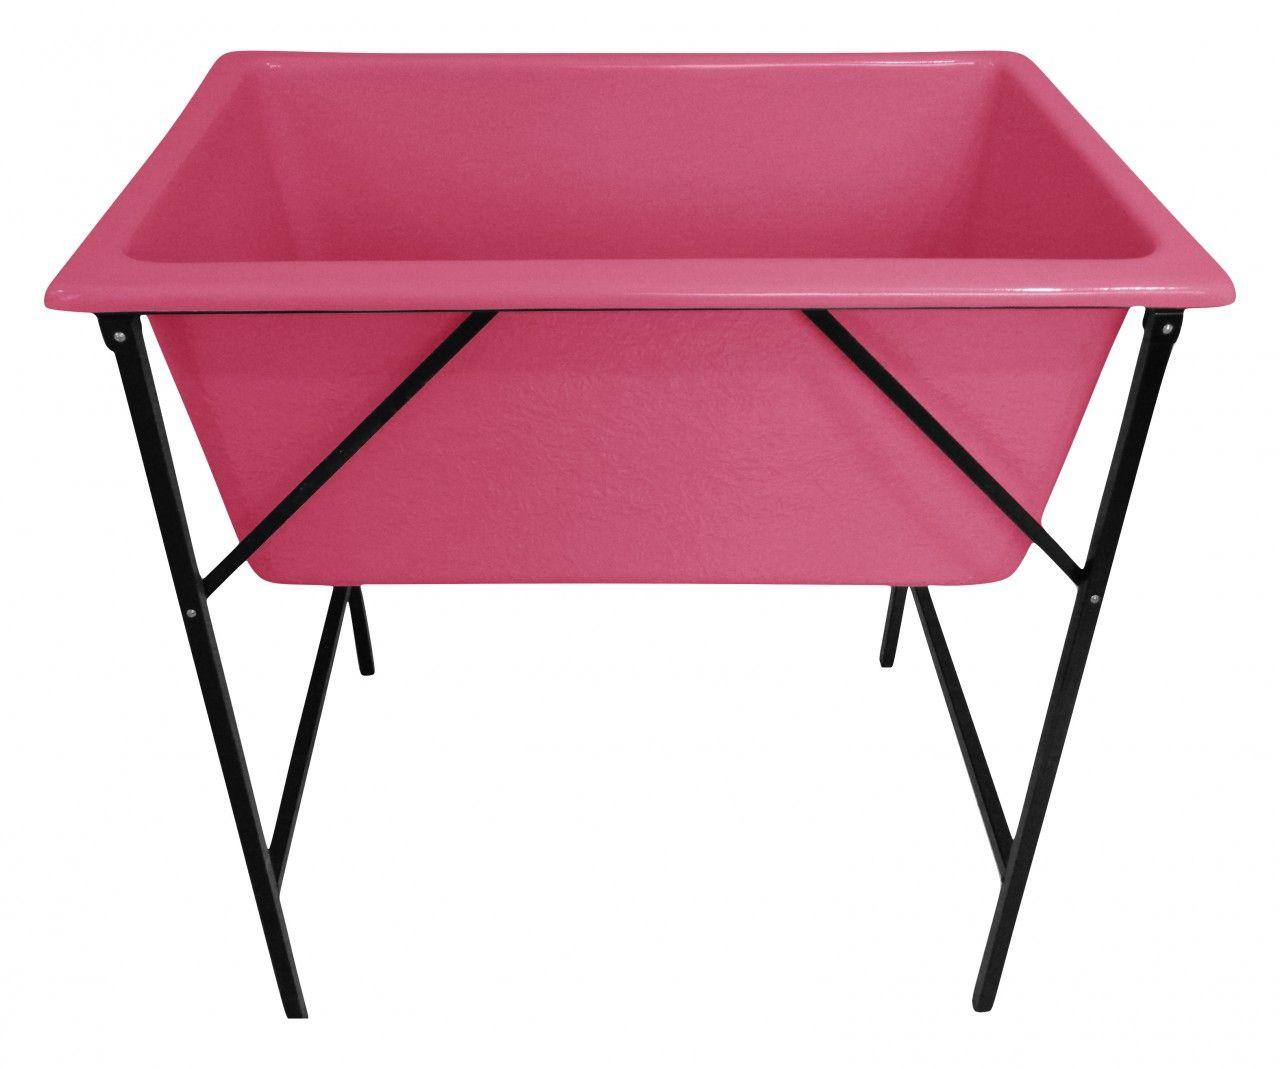 Banheira Orion Pequena Pink